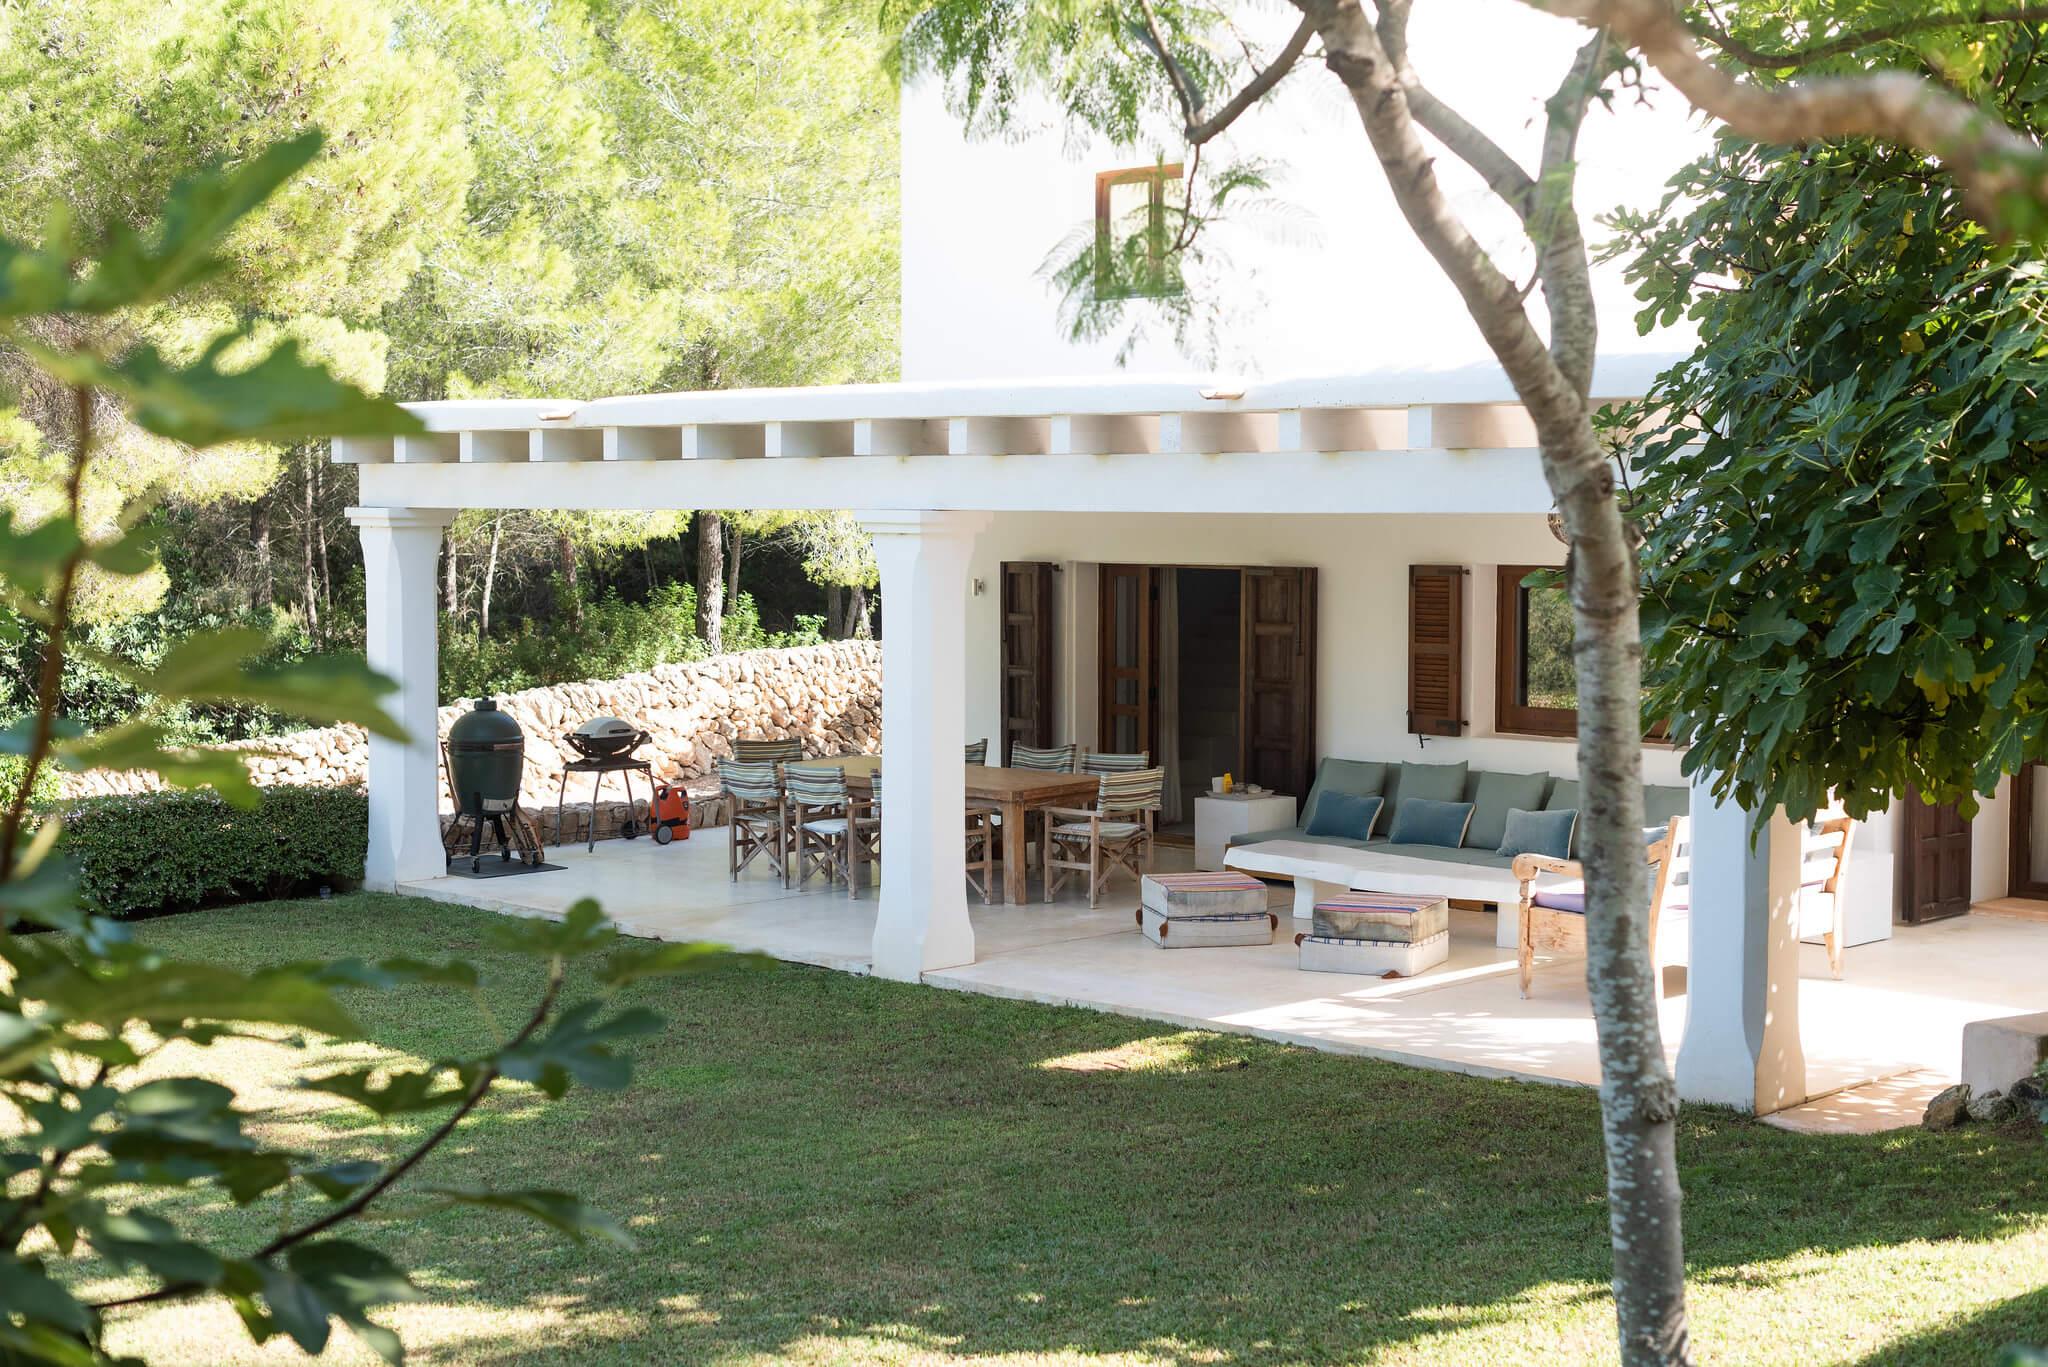 https://www.white-ibiza.com/wp-content/uploads/2020/06/white-ibiza-villas-casa-arabella-exterior-lawn2.jpg